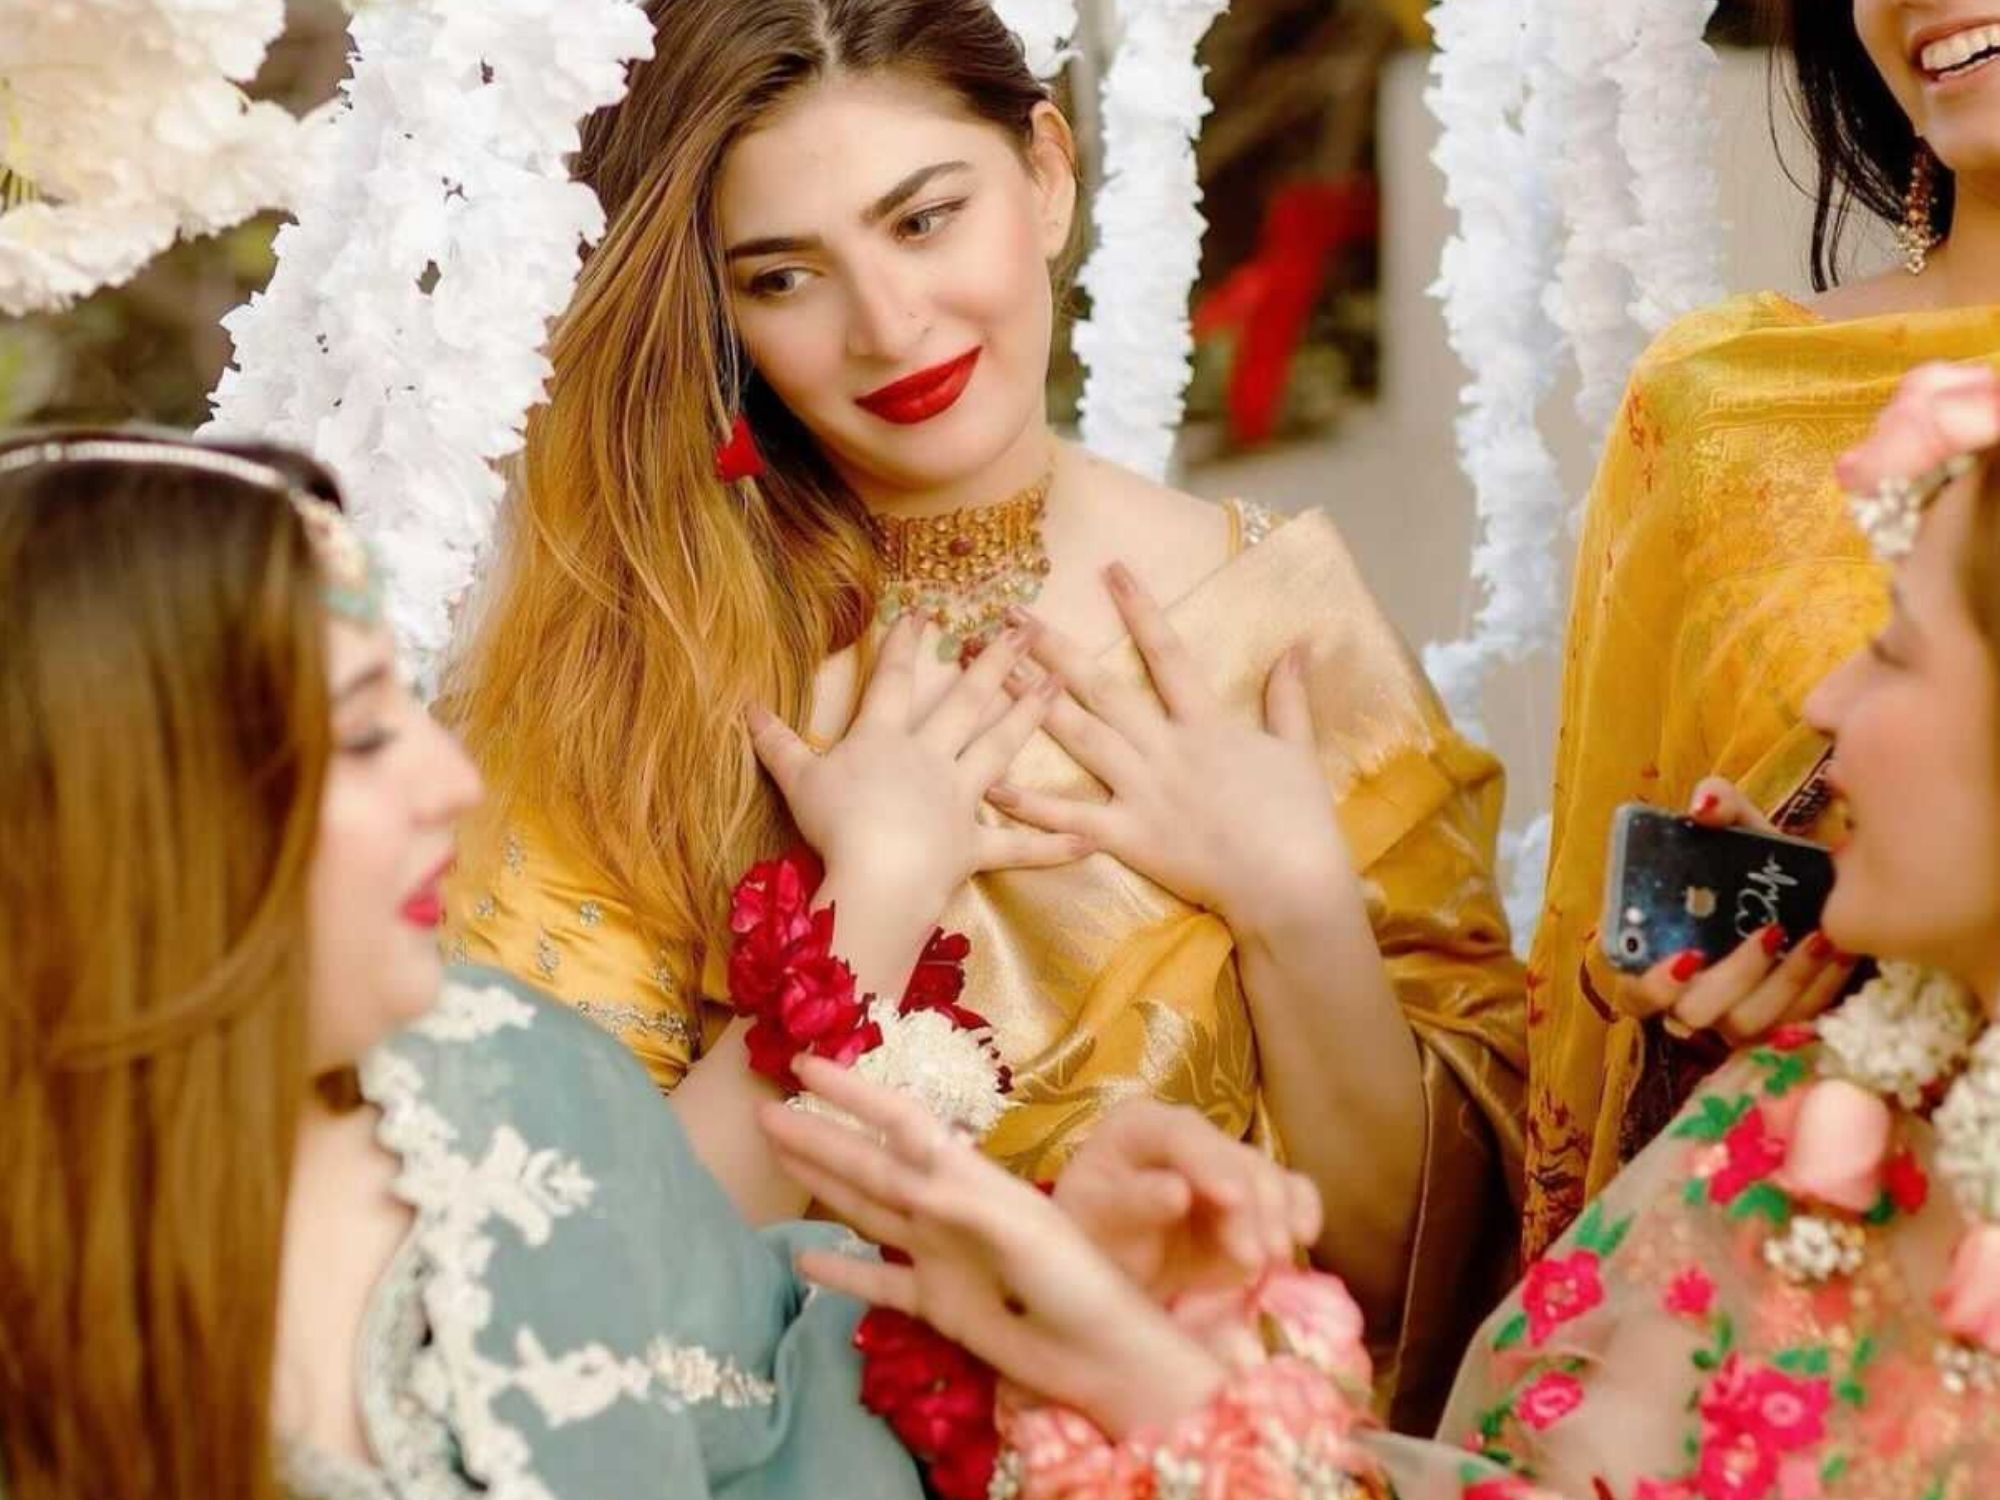 in pictures naimal khawar abbasi is a vision in mustard sari